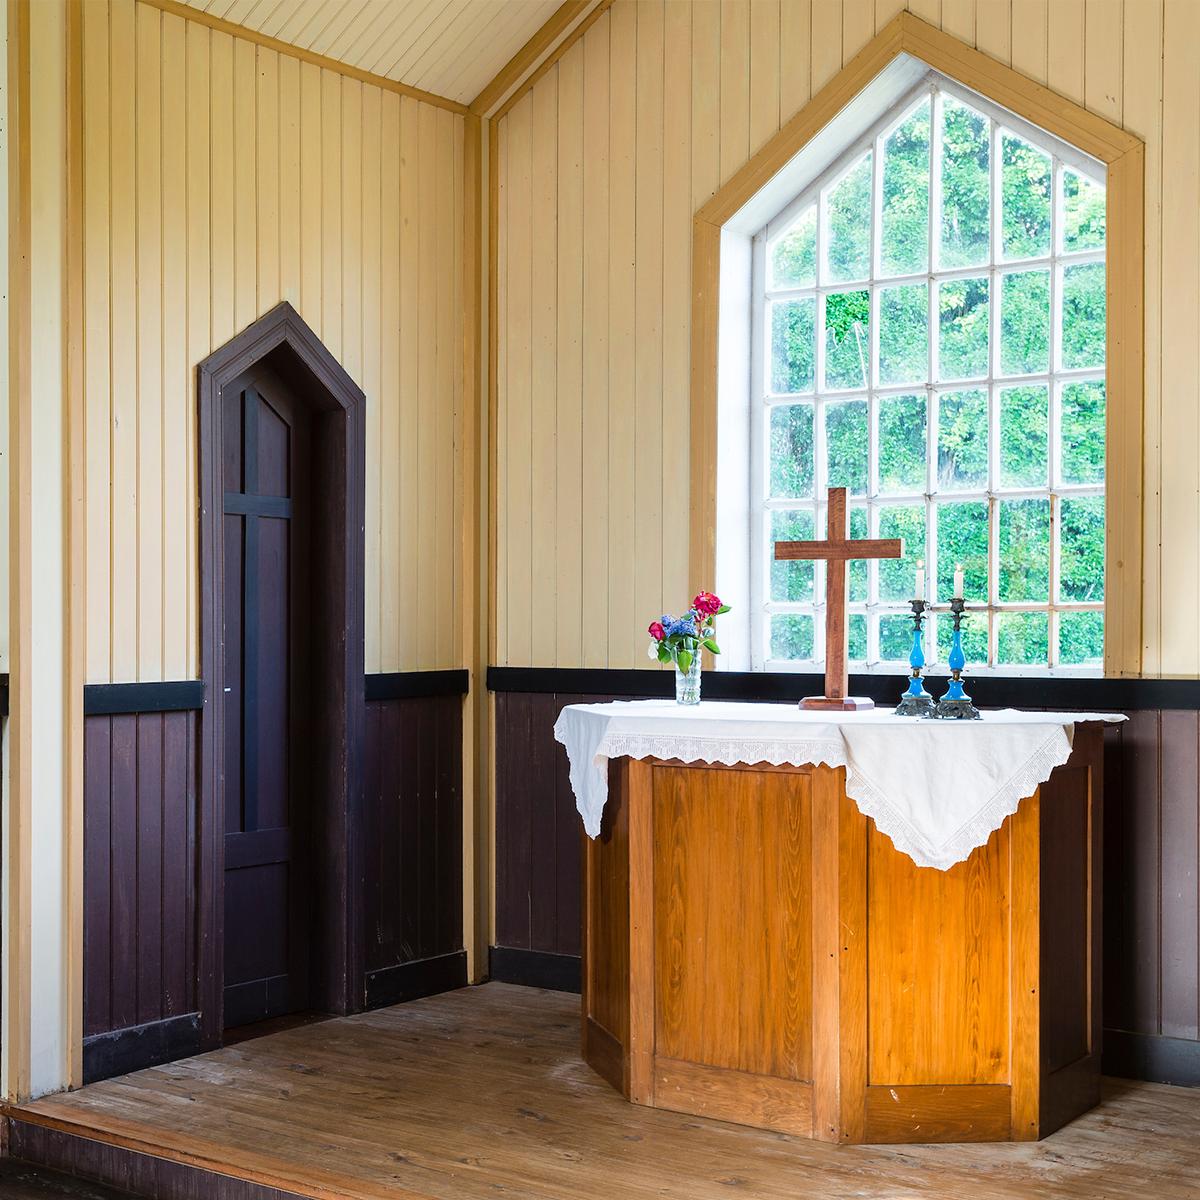 iglesia-luterana-en-la-fabrica